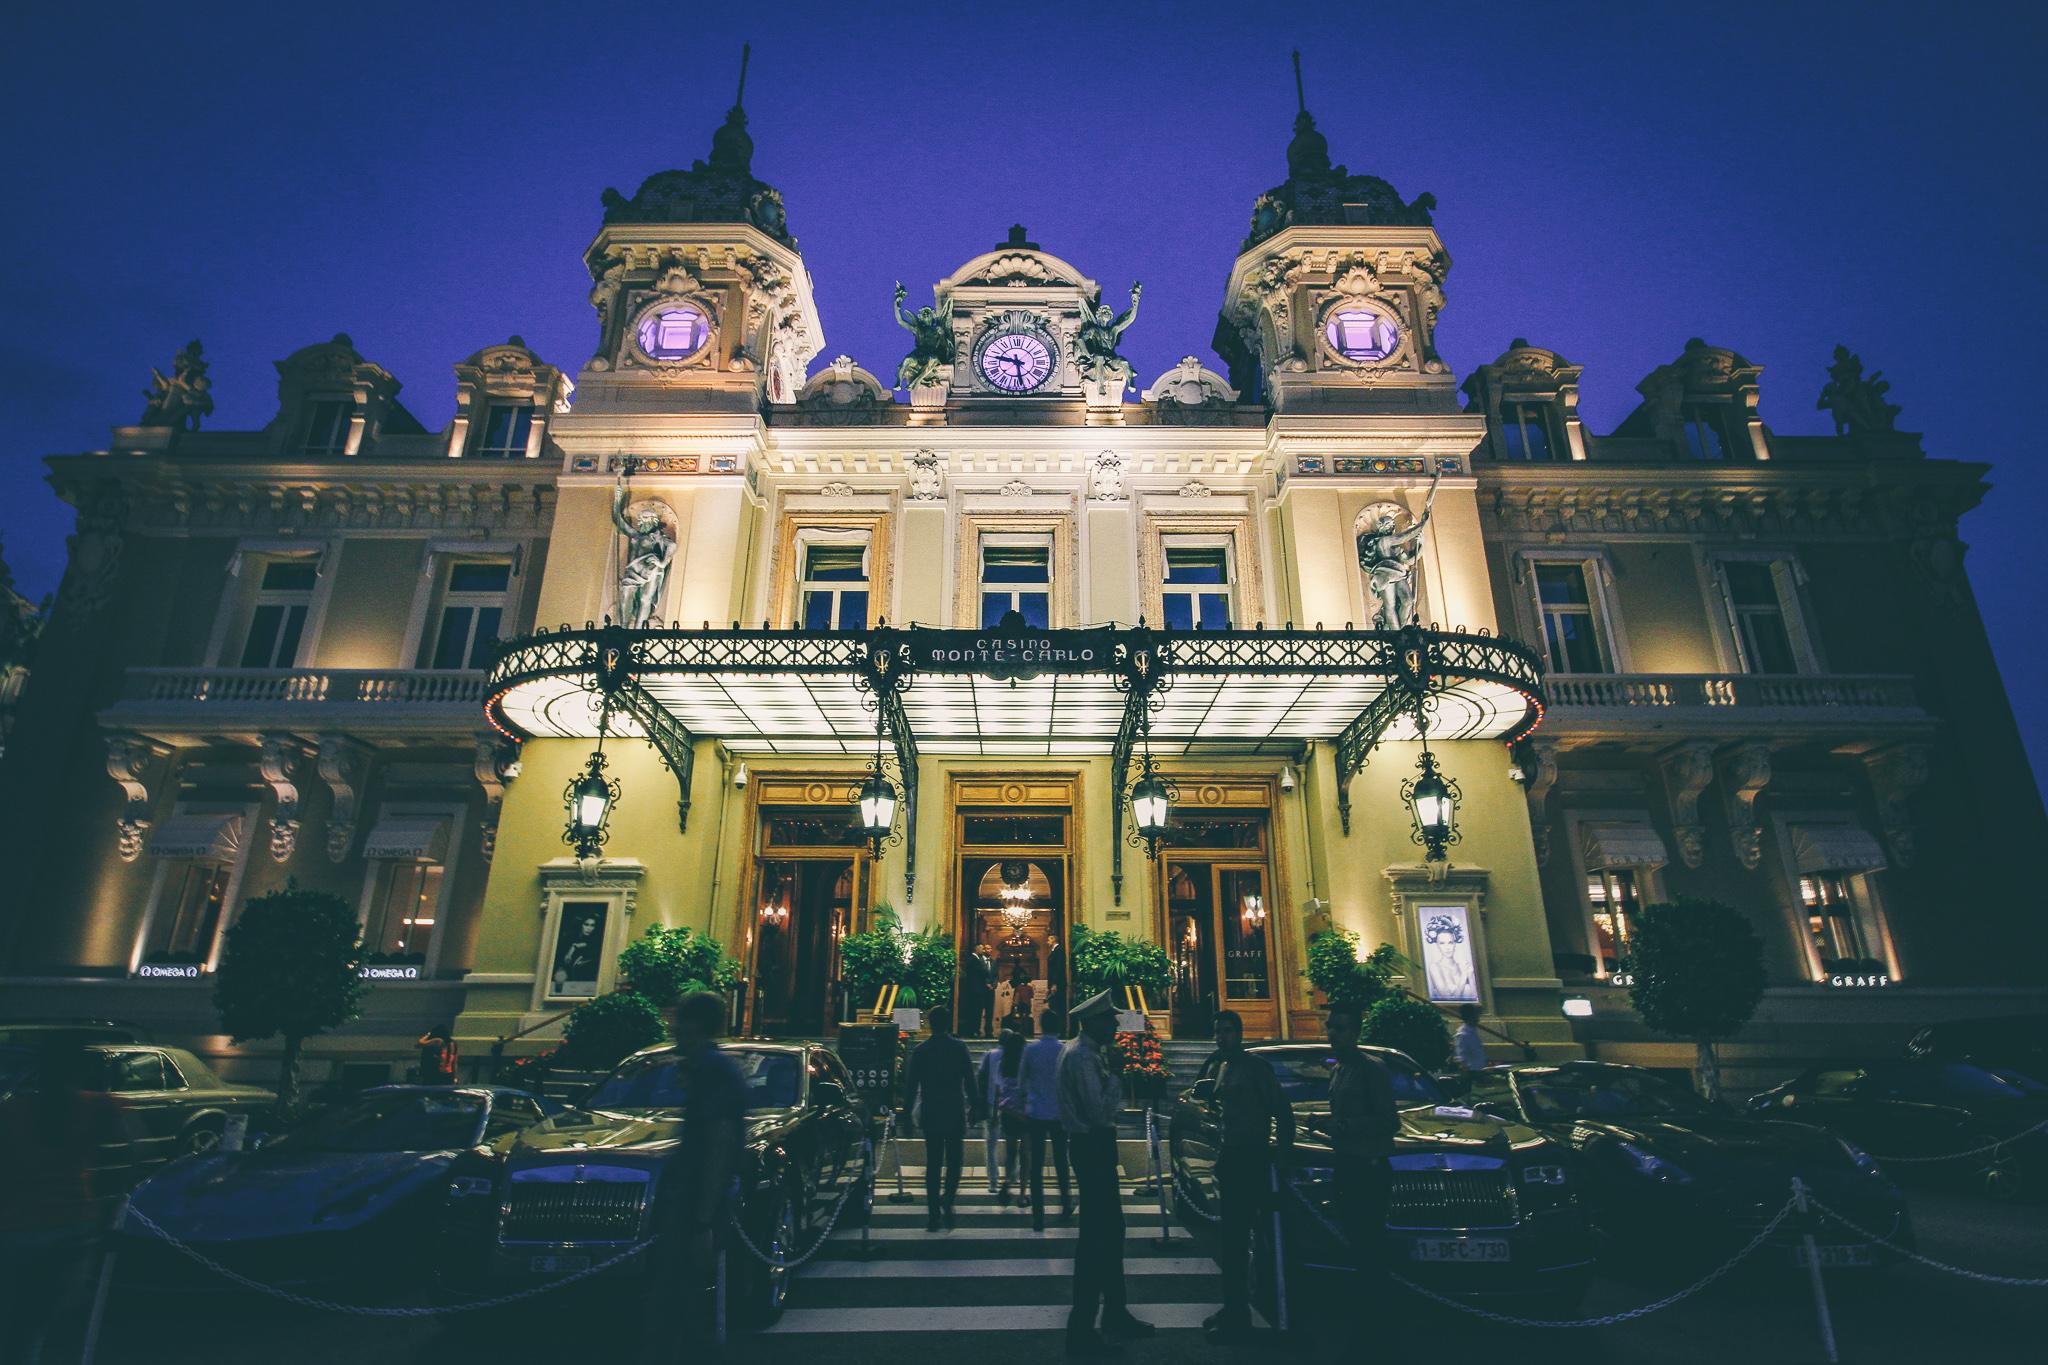 Casino de Monte-Carlo, Monaco - a monacói kaszinó